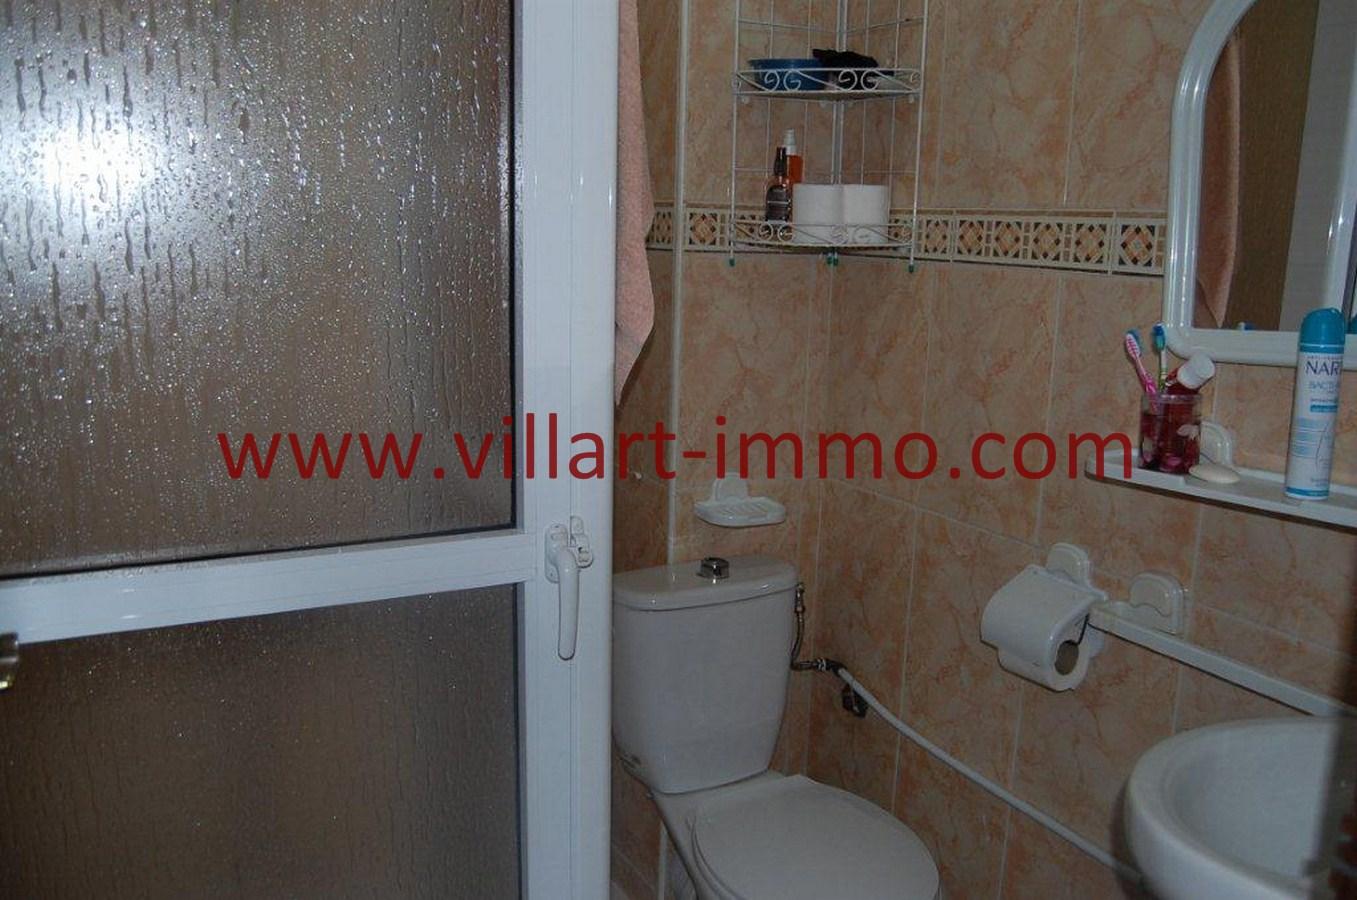 5-Vente-Appartement-Tanger-Centre-Ville -Salle-De-Bain -VA483-Villart Immo